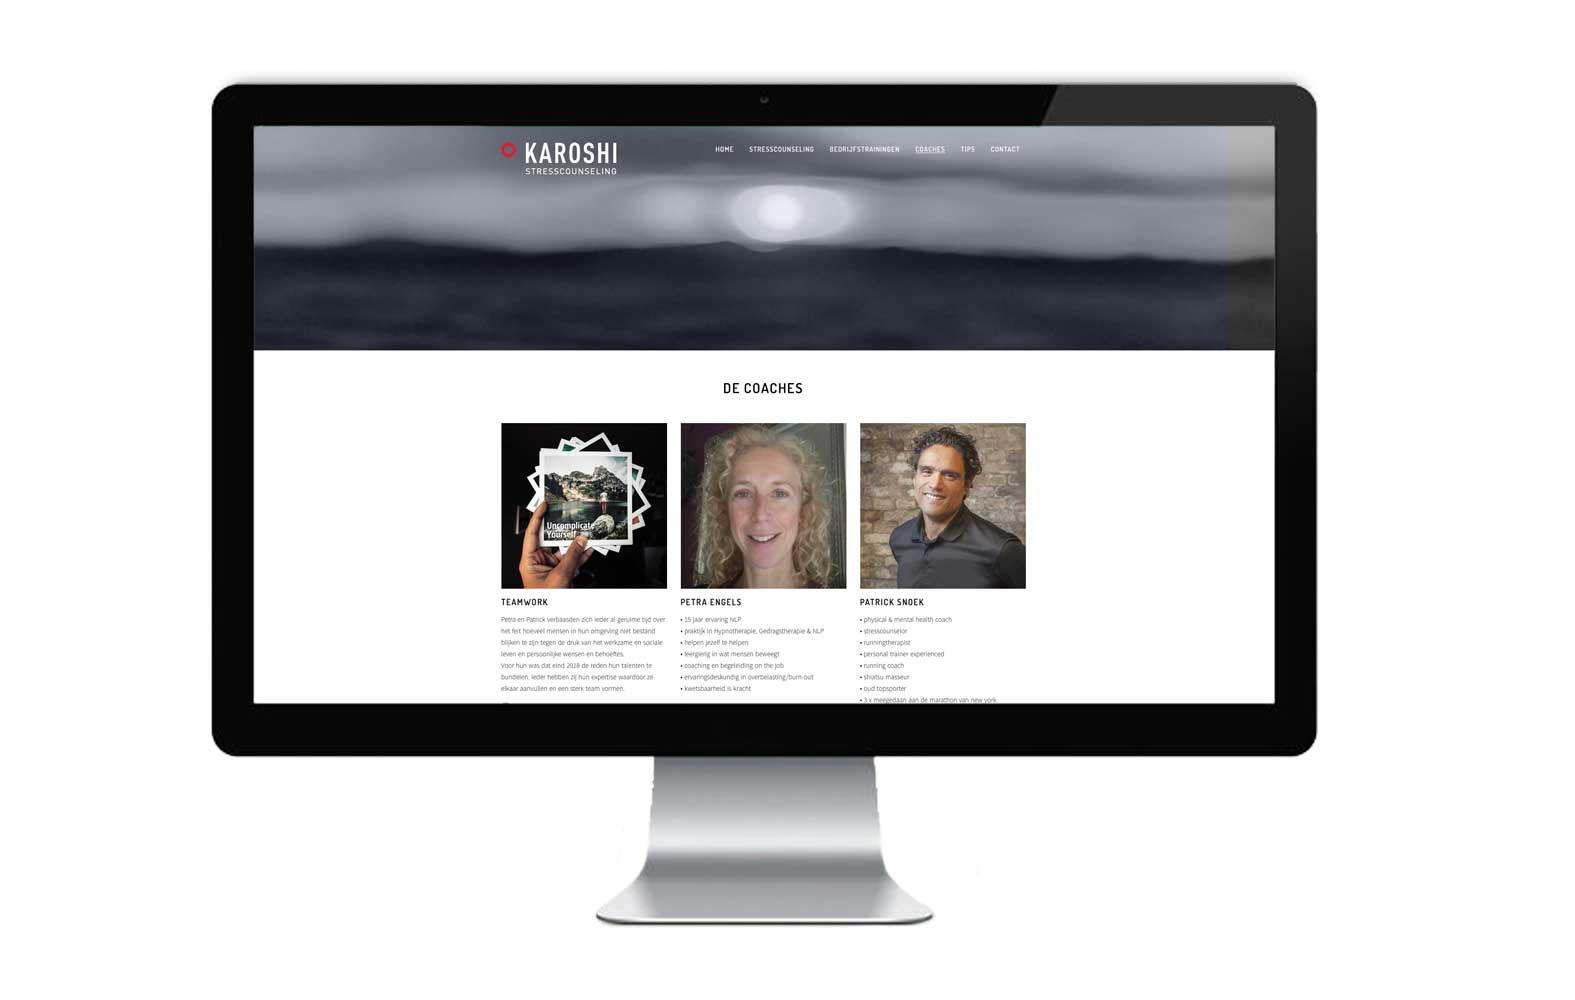 StudioErnst-WebDesign-Karoshi3